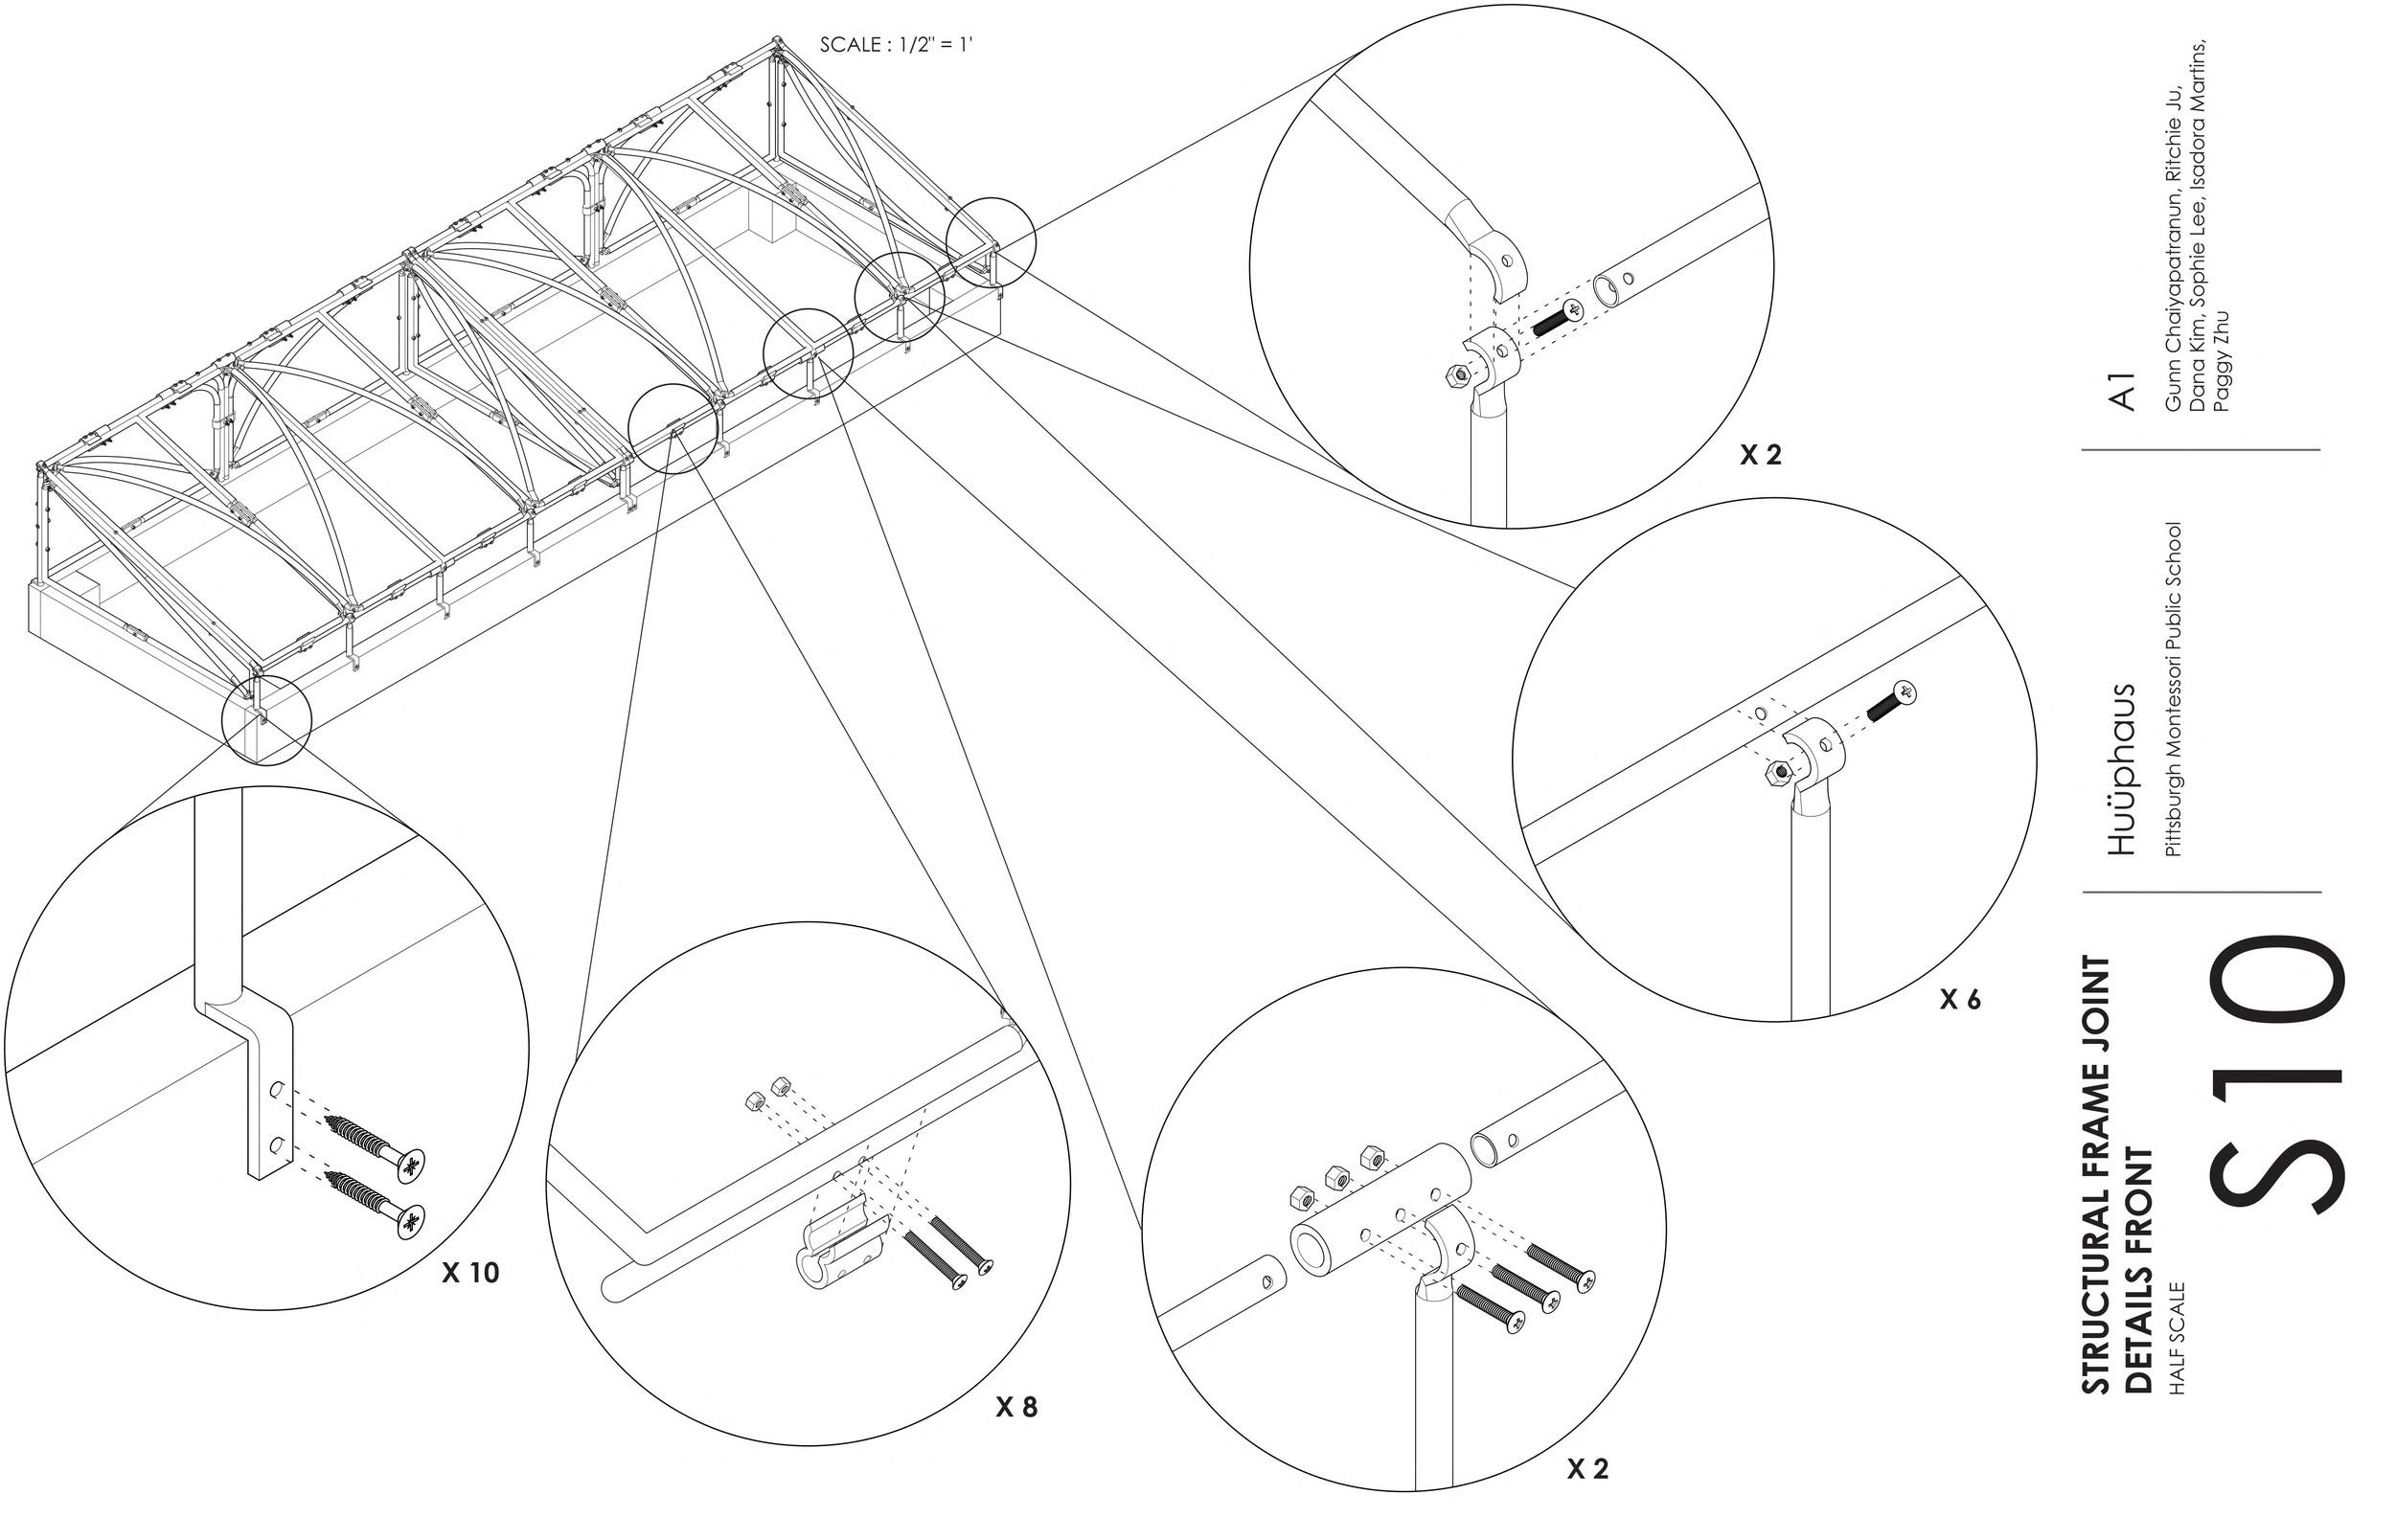 Arscott1-Drawing pack-10.jpg